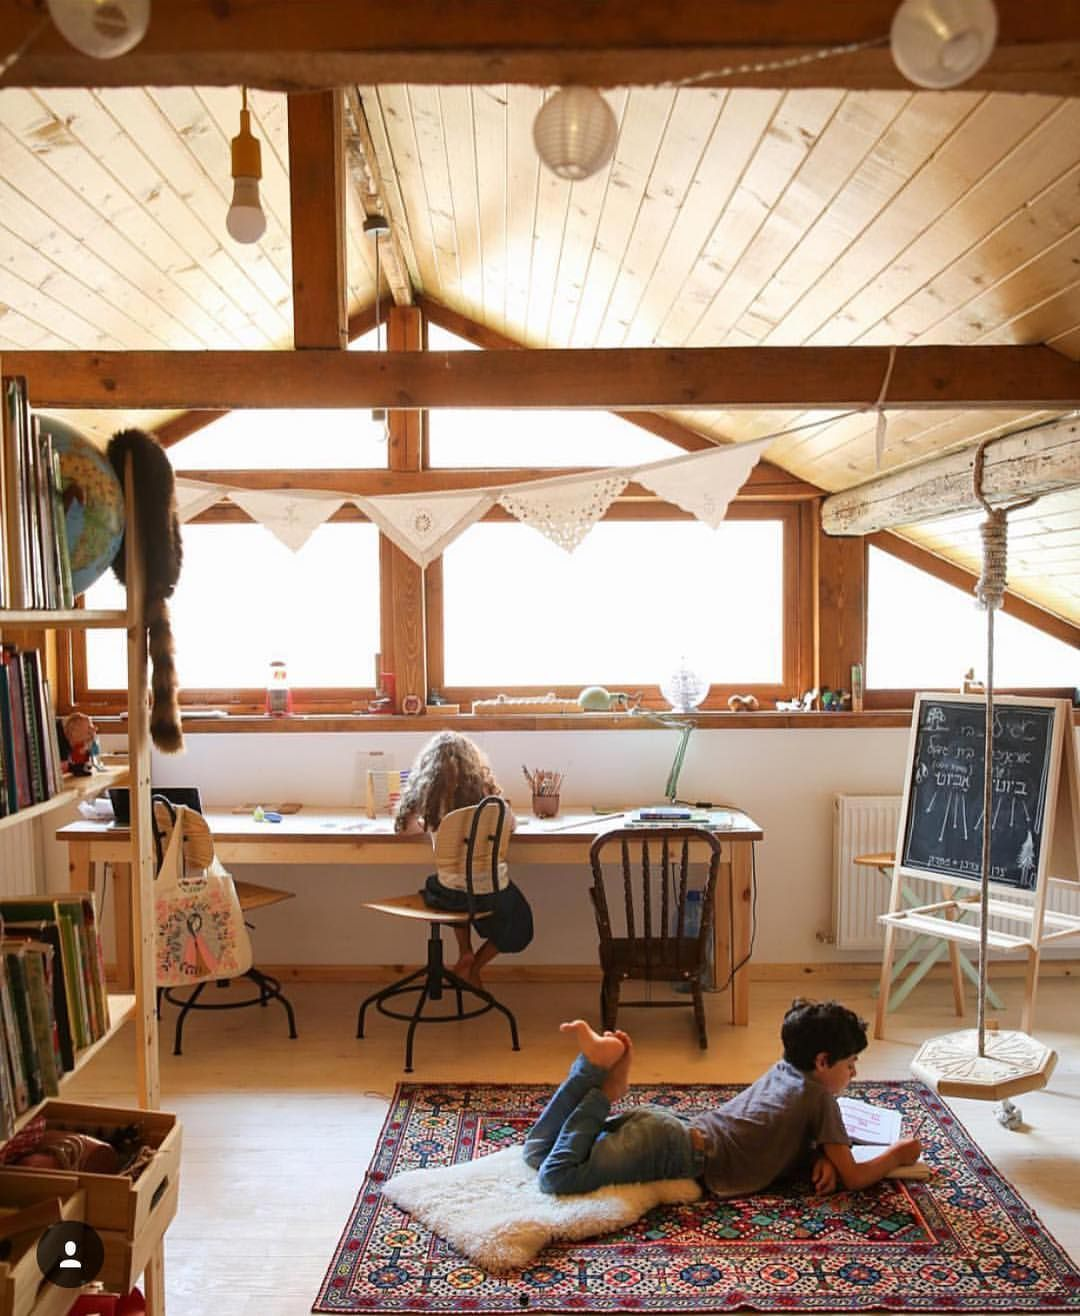 Minimalist Homeschool Room: Pin By Abbie Baillargeon On Homeschool Room In 2019